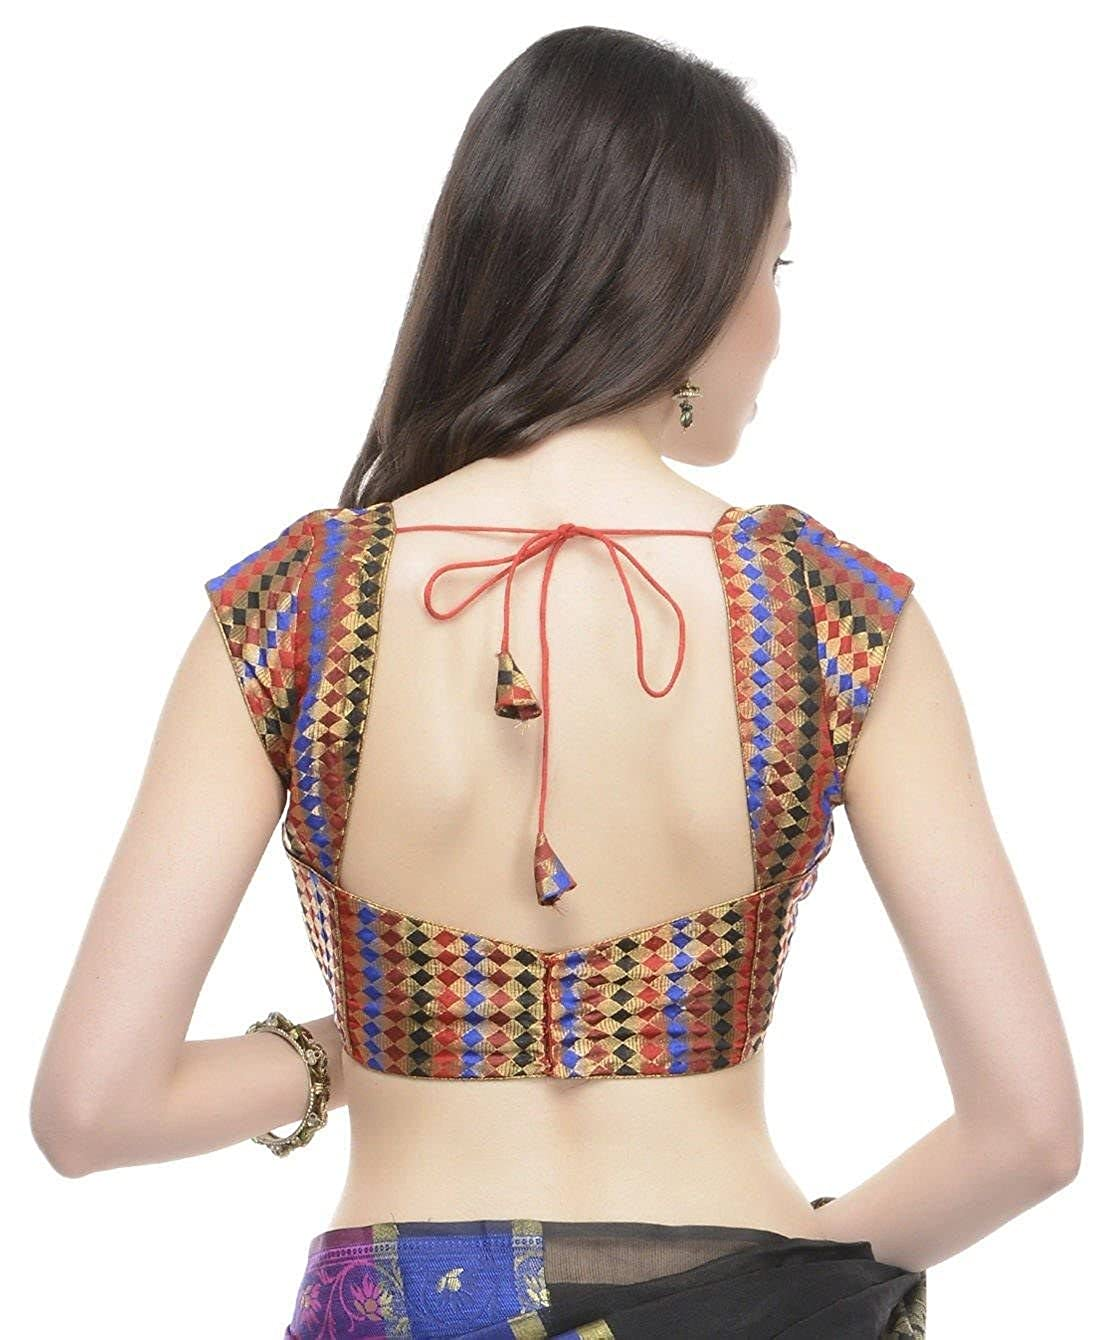 6443228ac8c71d Amazon.com: Short Sleeve Blouse - Multicolor Gold Brocade Saree Dress Top  Fashion Choli 34